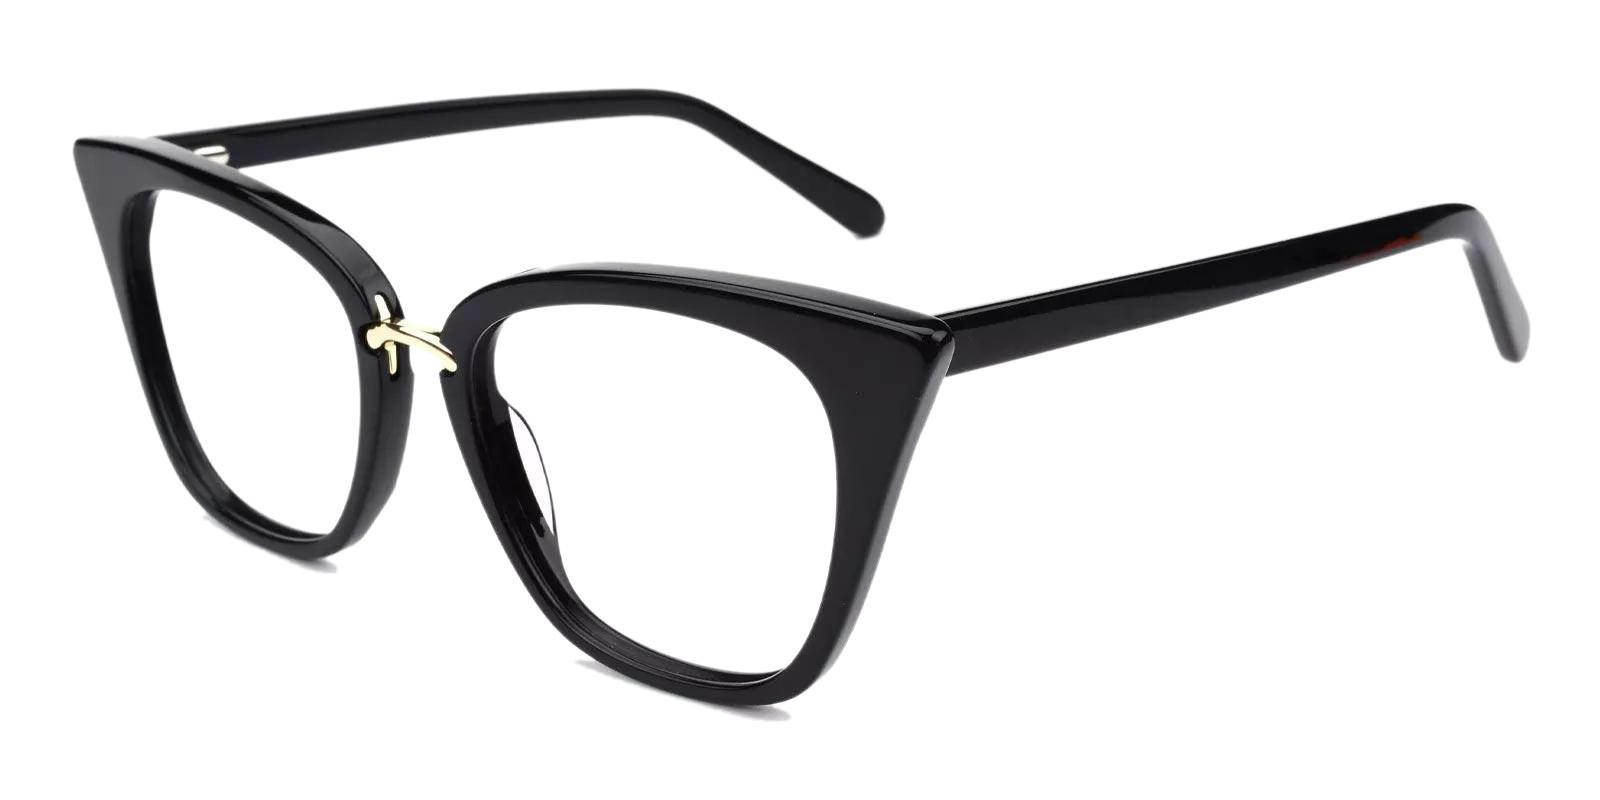 Damara Black Acetate , Metal Eyeglasses , Fashion , SpringHinges , UniversalBridgeFit Frames from ABBE Glasses